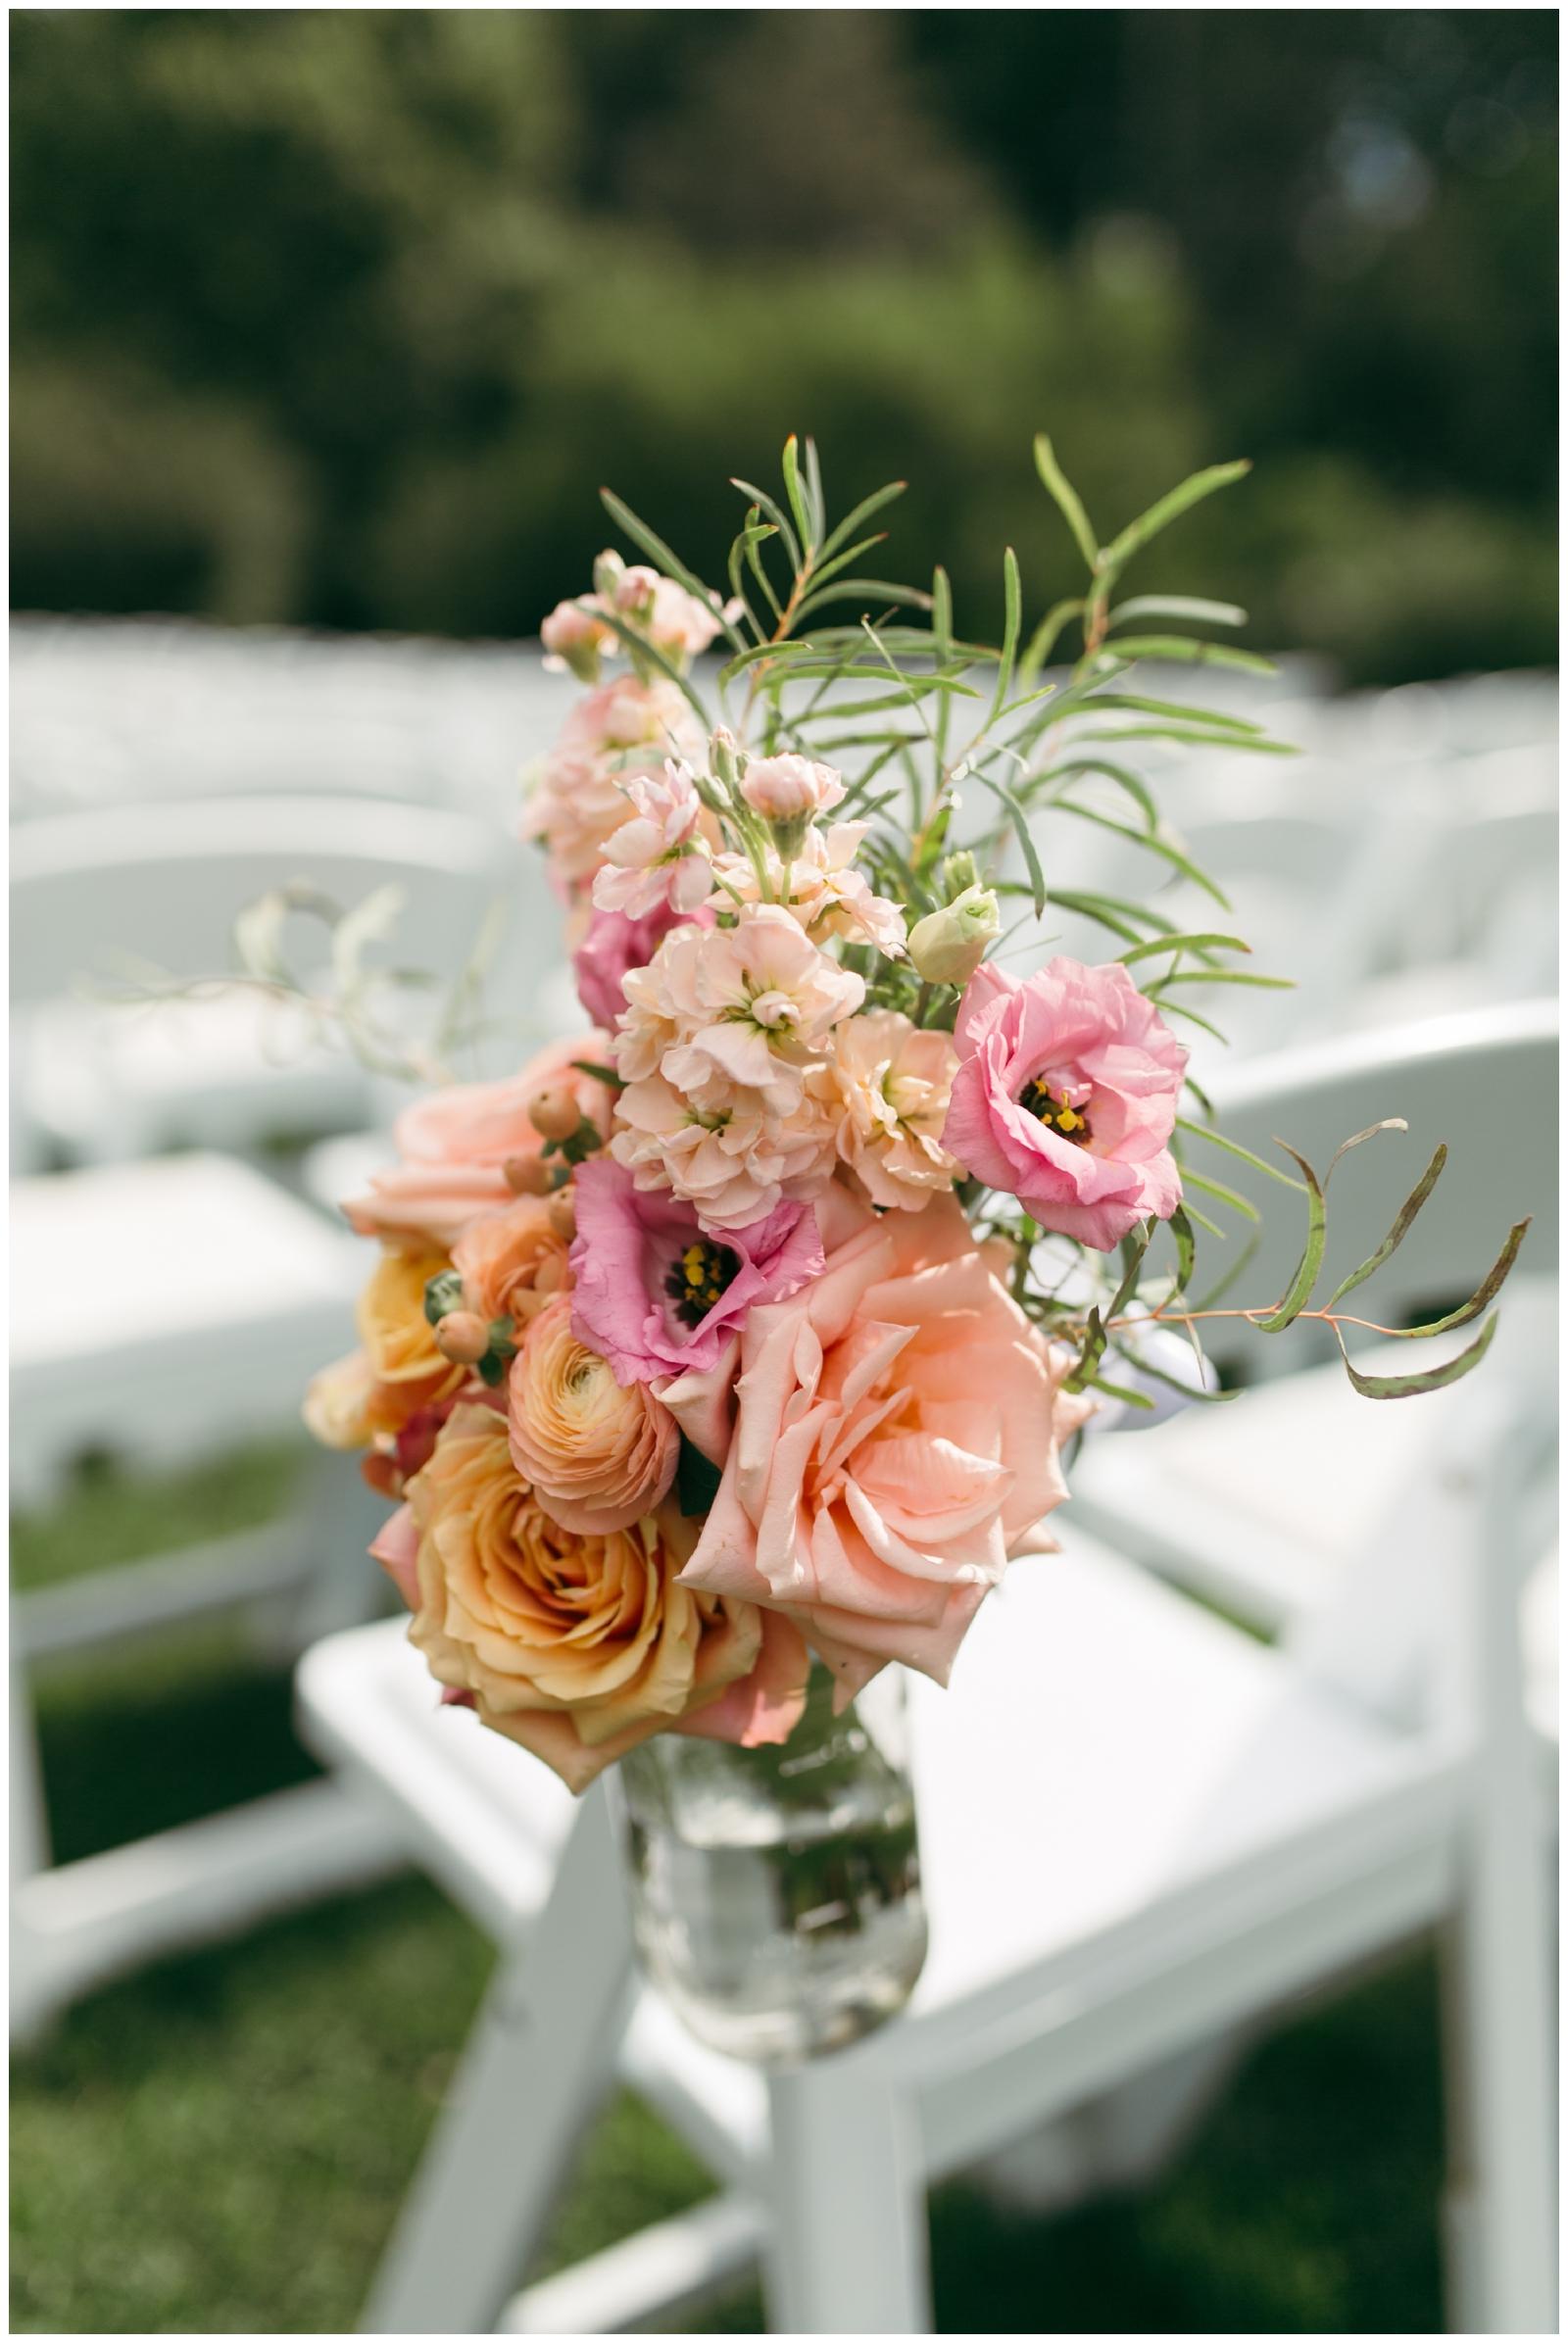 Moraine-Farm-wedding-Bailey-Q-Photo-Massachusetts-wedding-photpgrapher-050.jpg